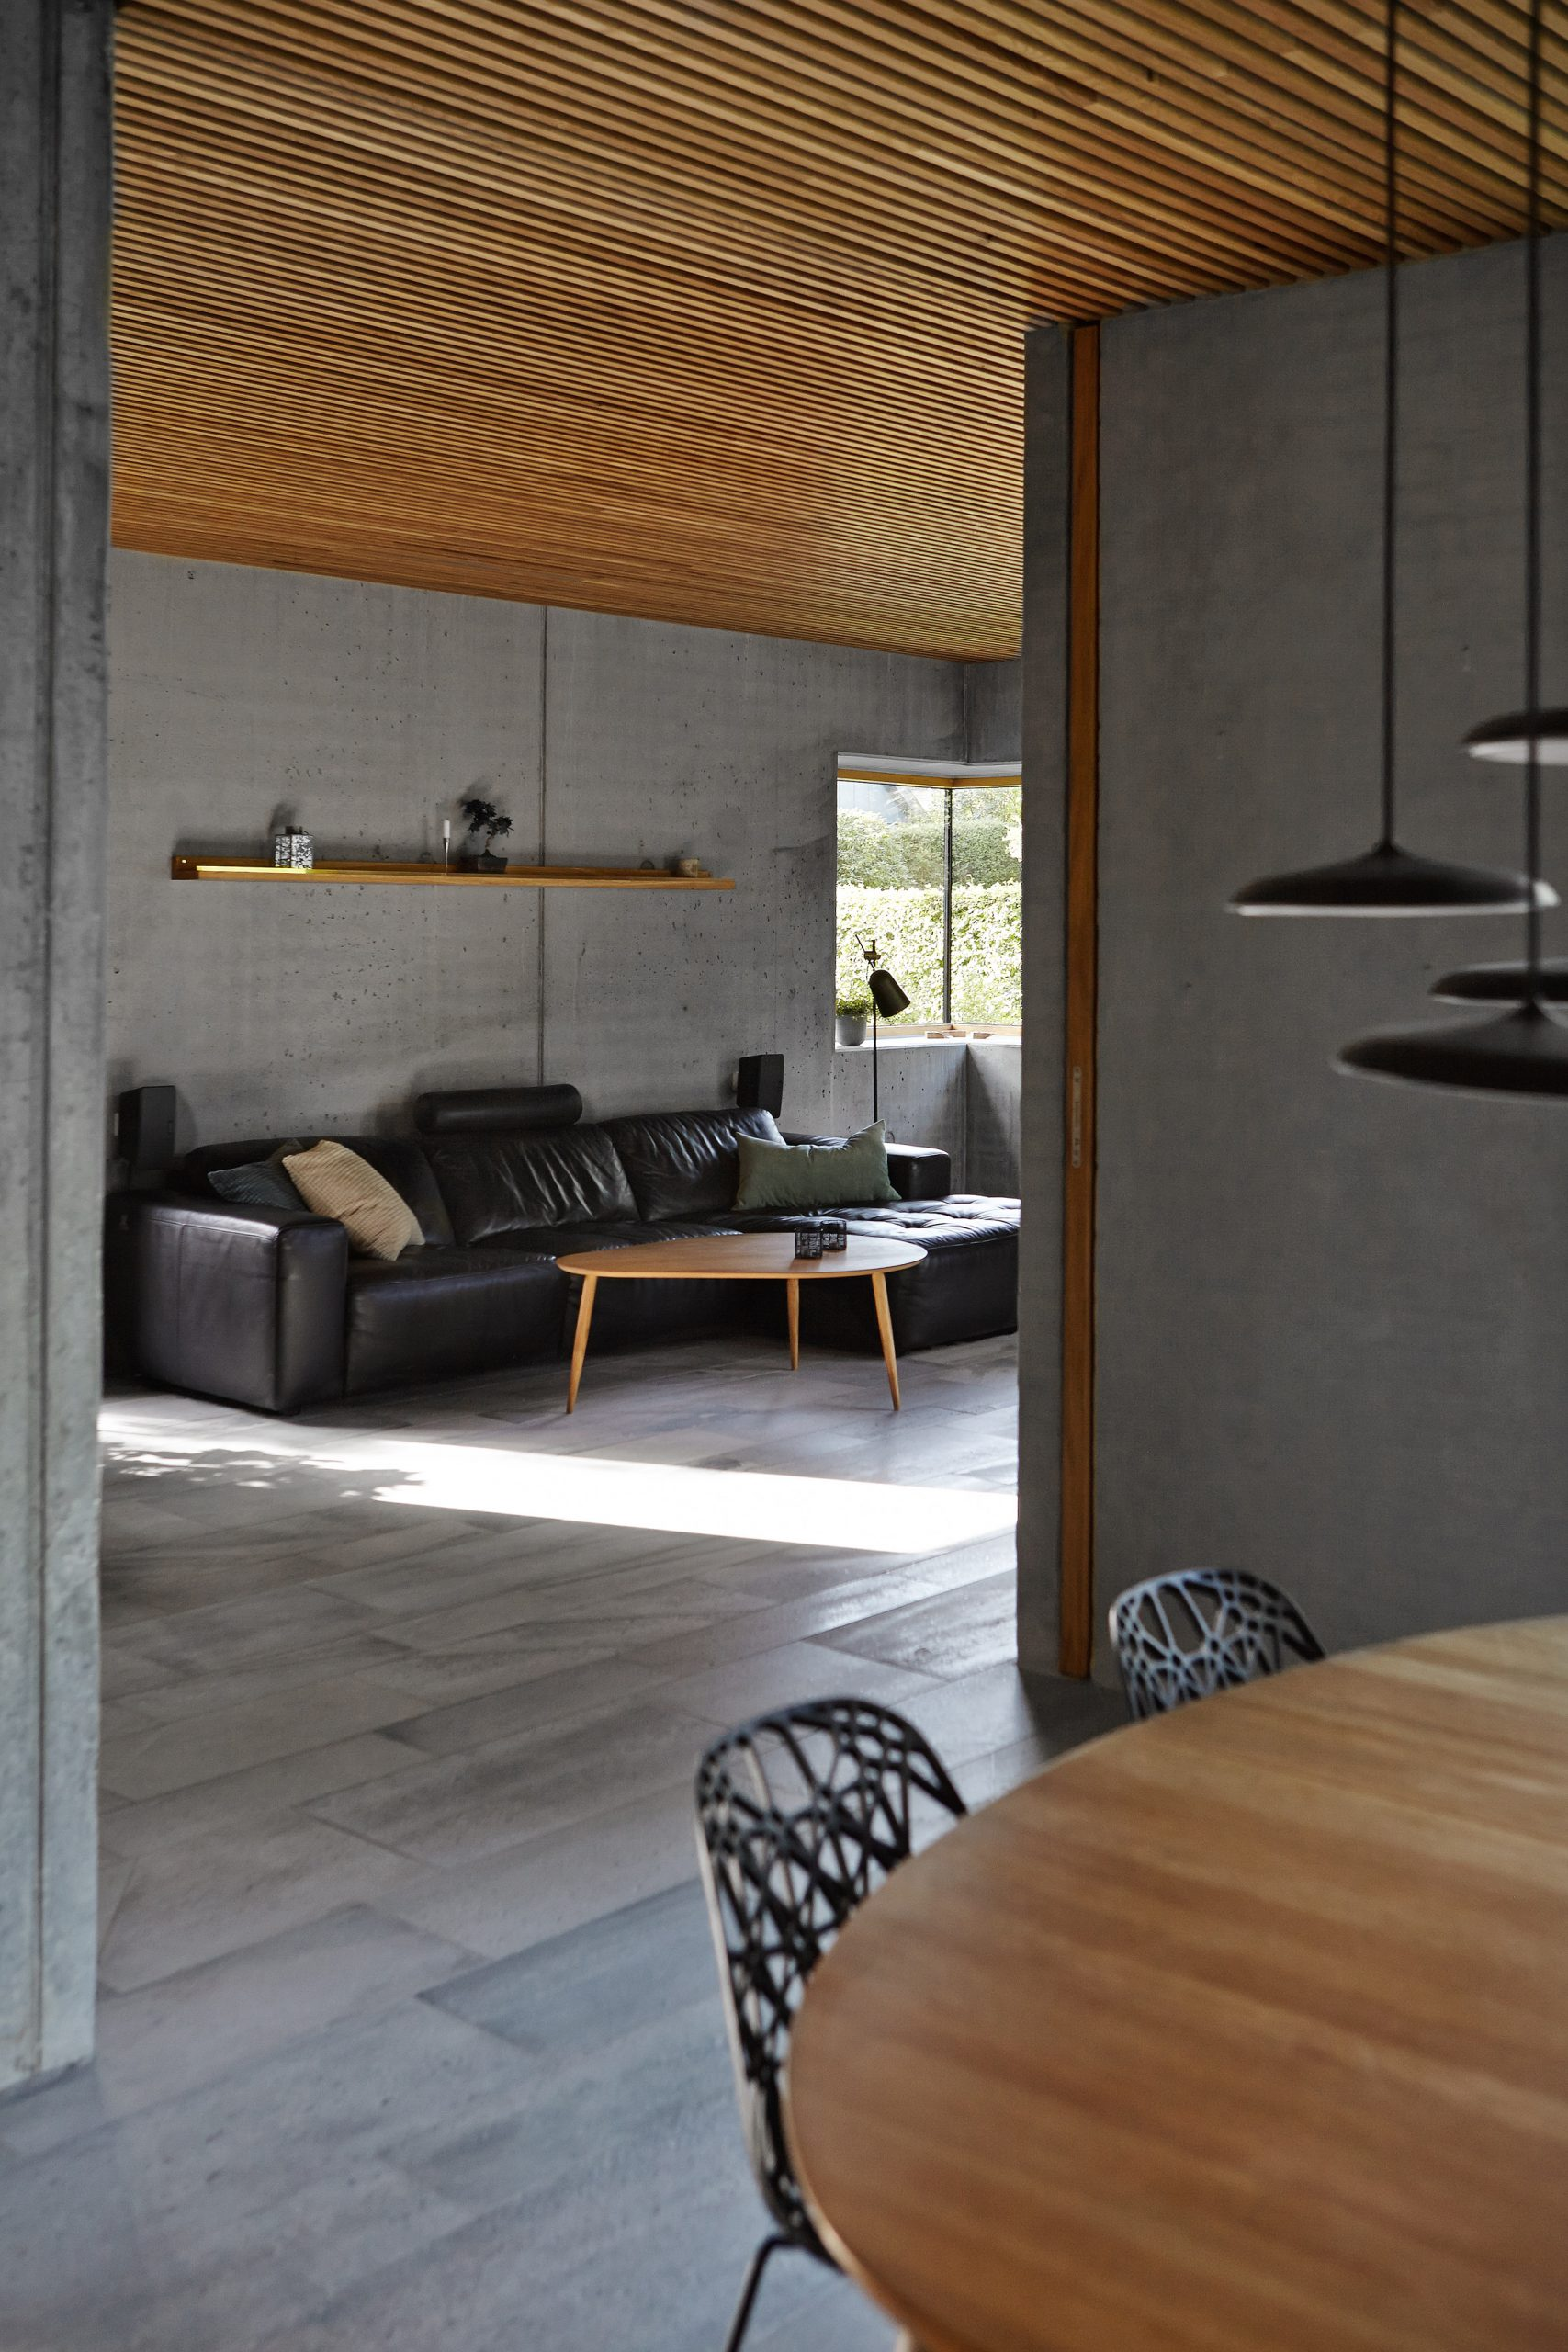 tommy-rand-house-denmark_dezeen_2364_col_42-scaled.jpg